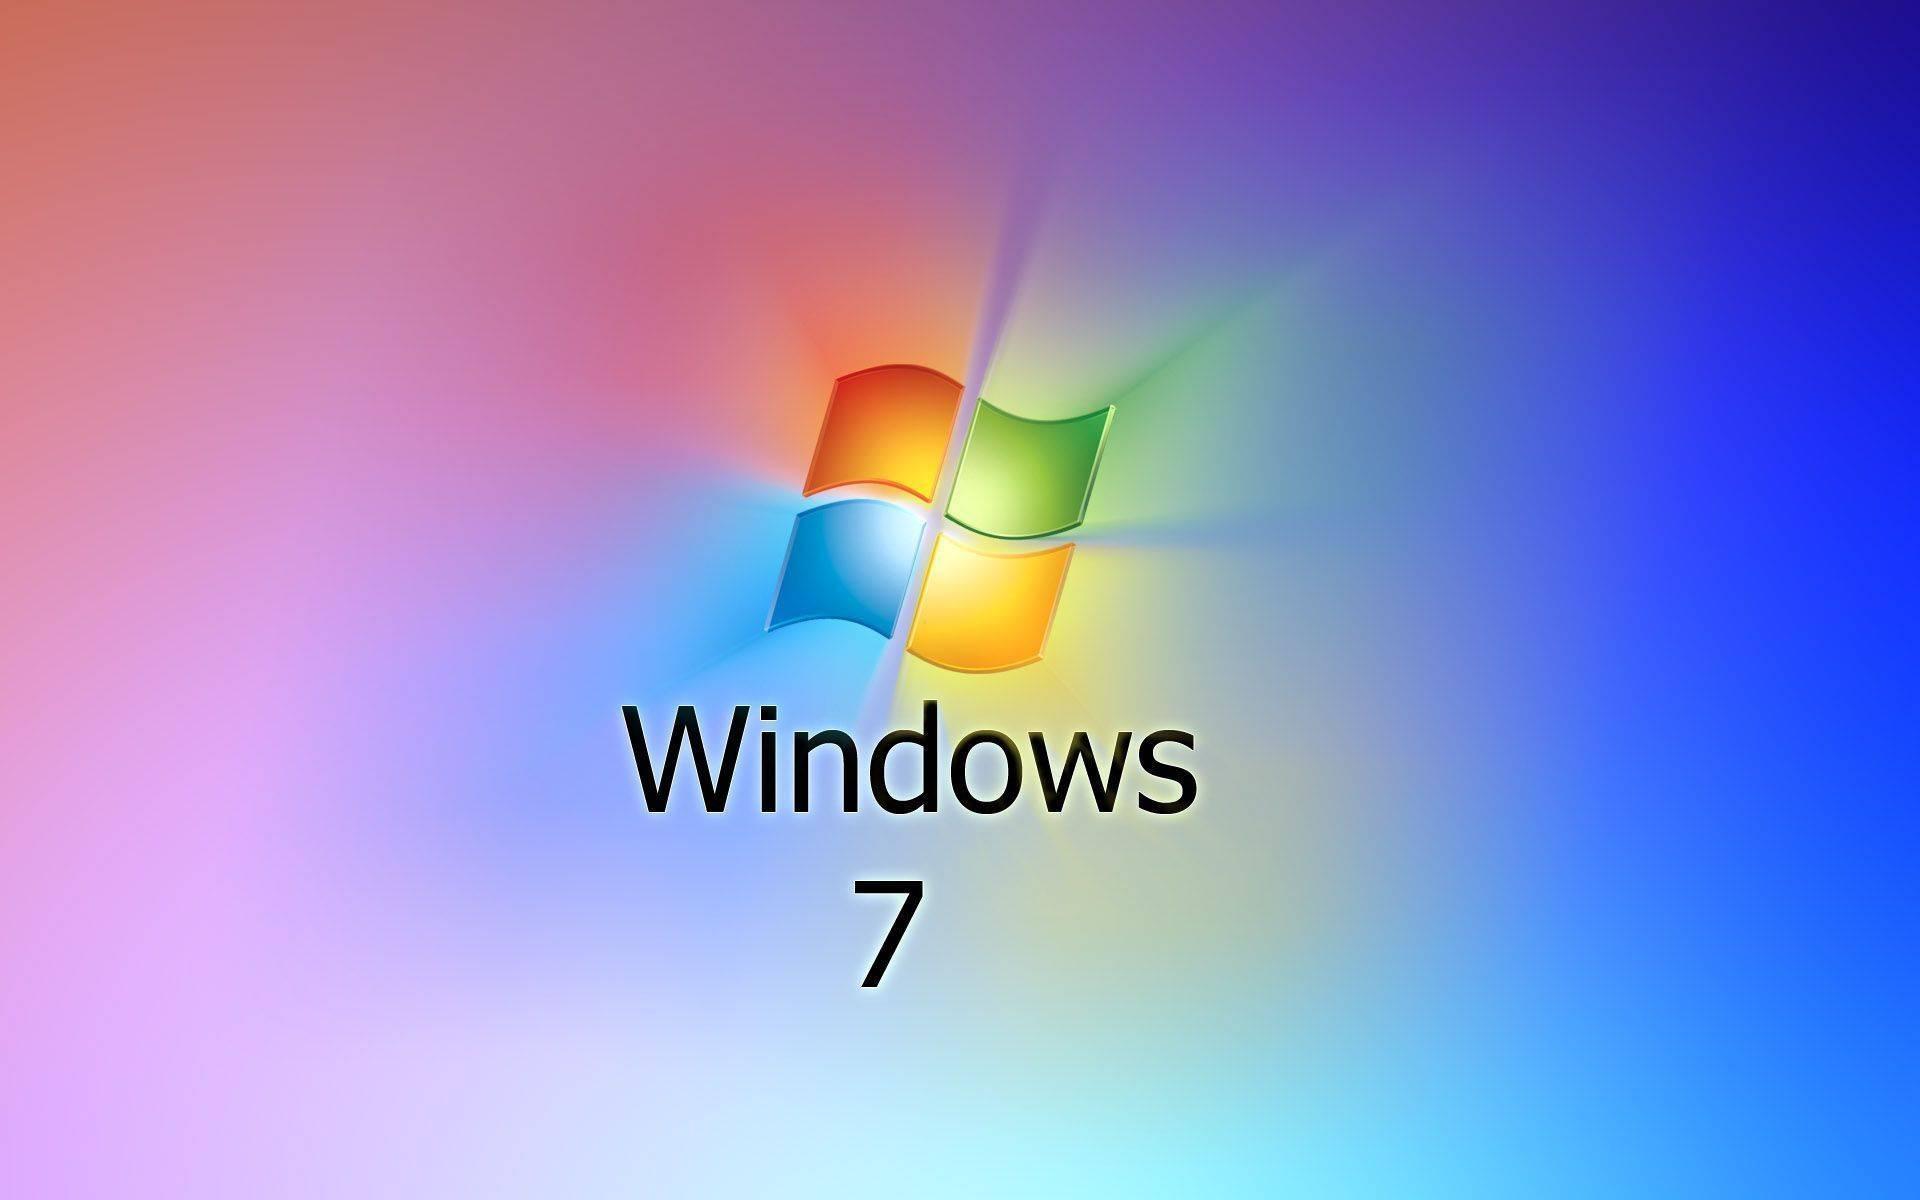 Windows 7 Logo 3D Wallpaper Free Download #269 Wallpaper .